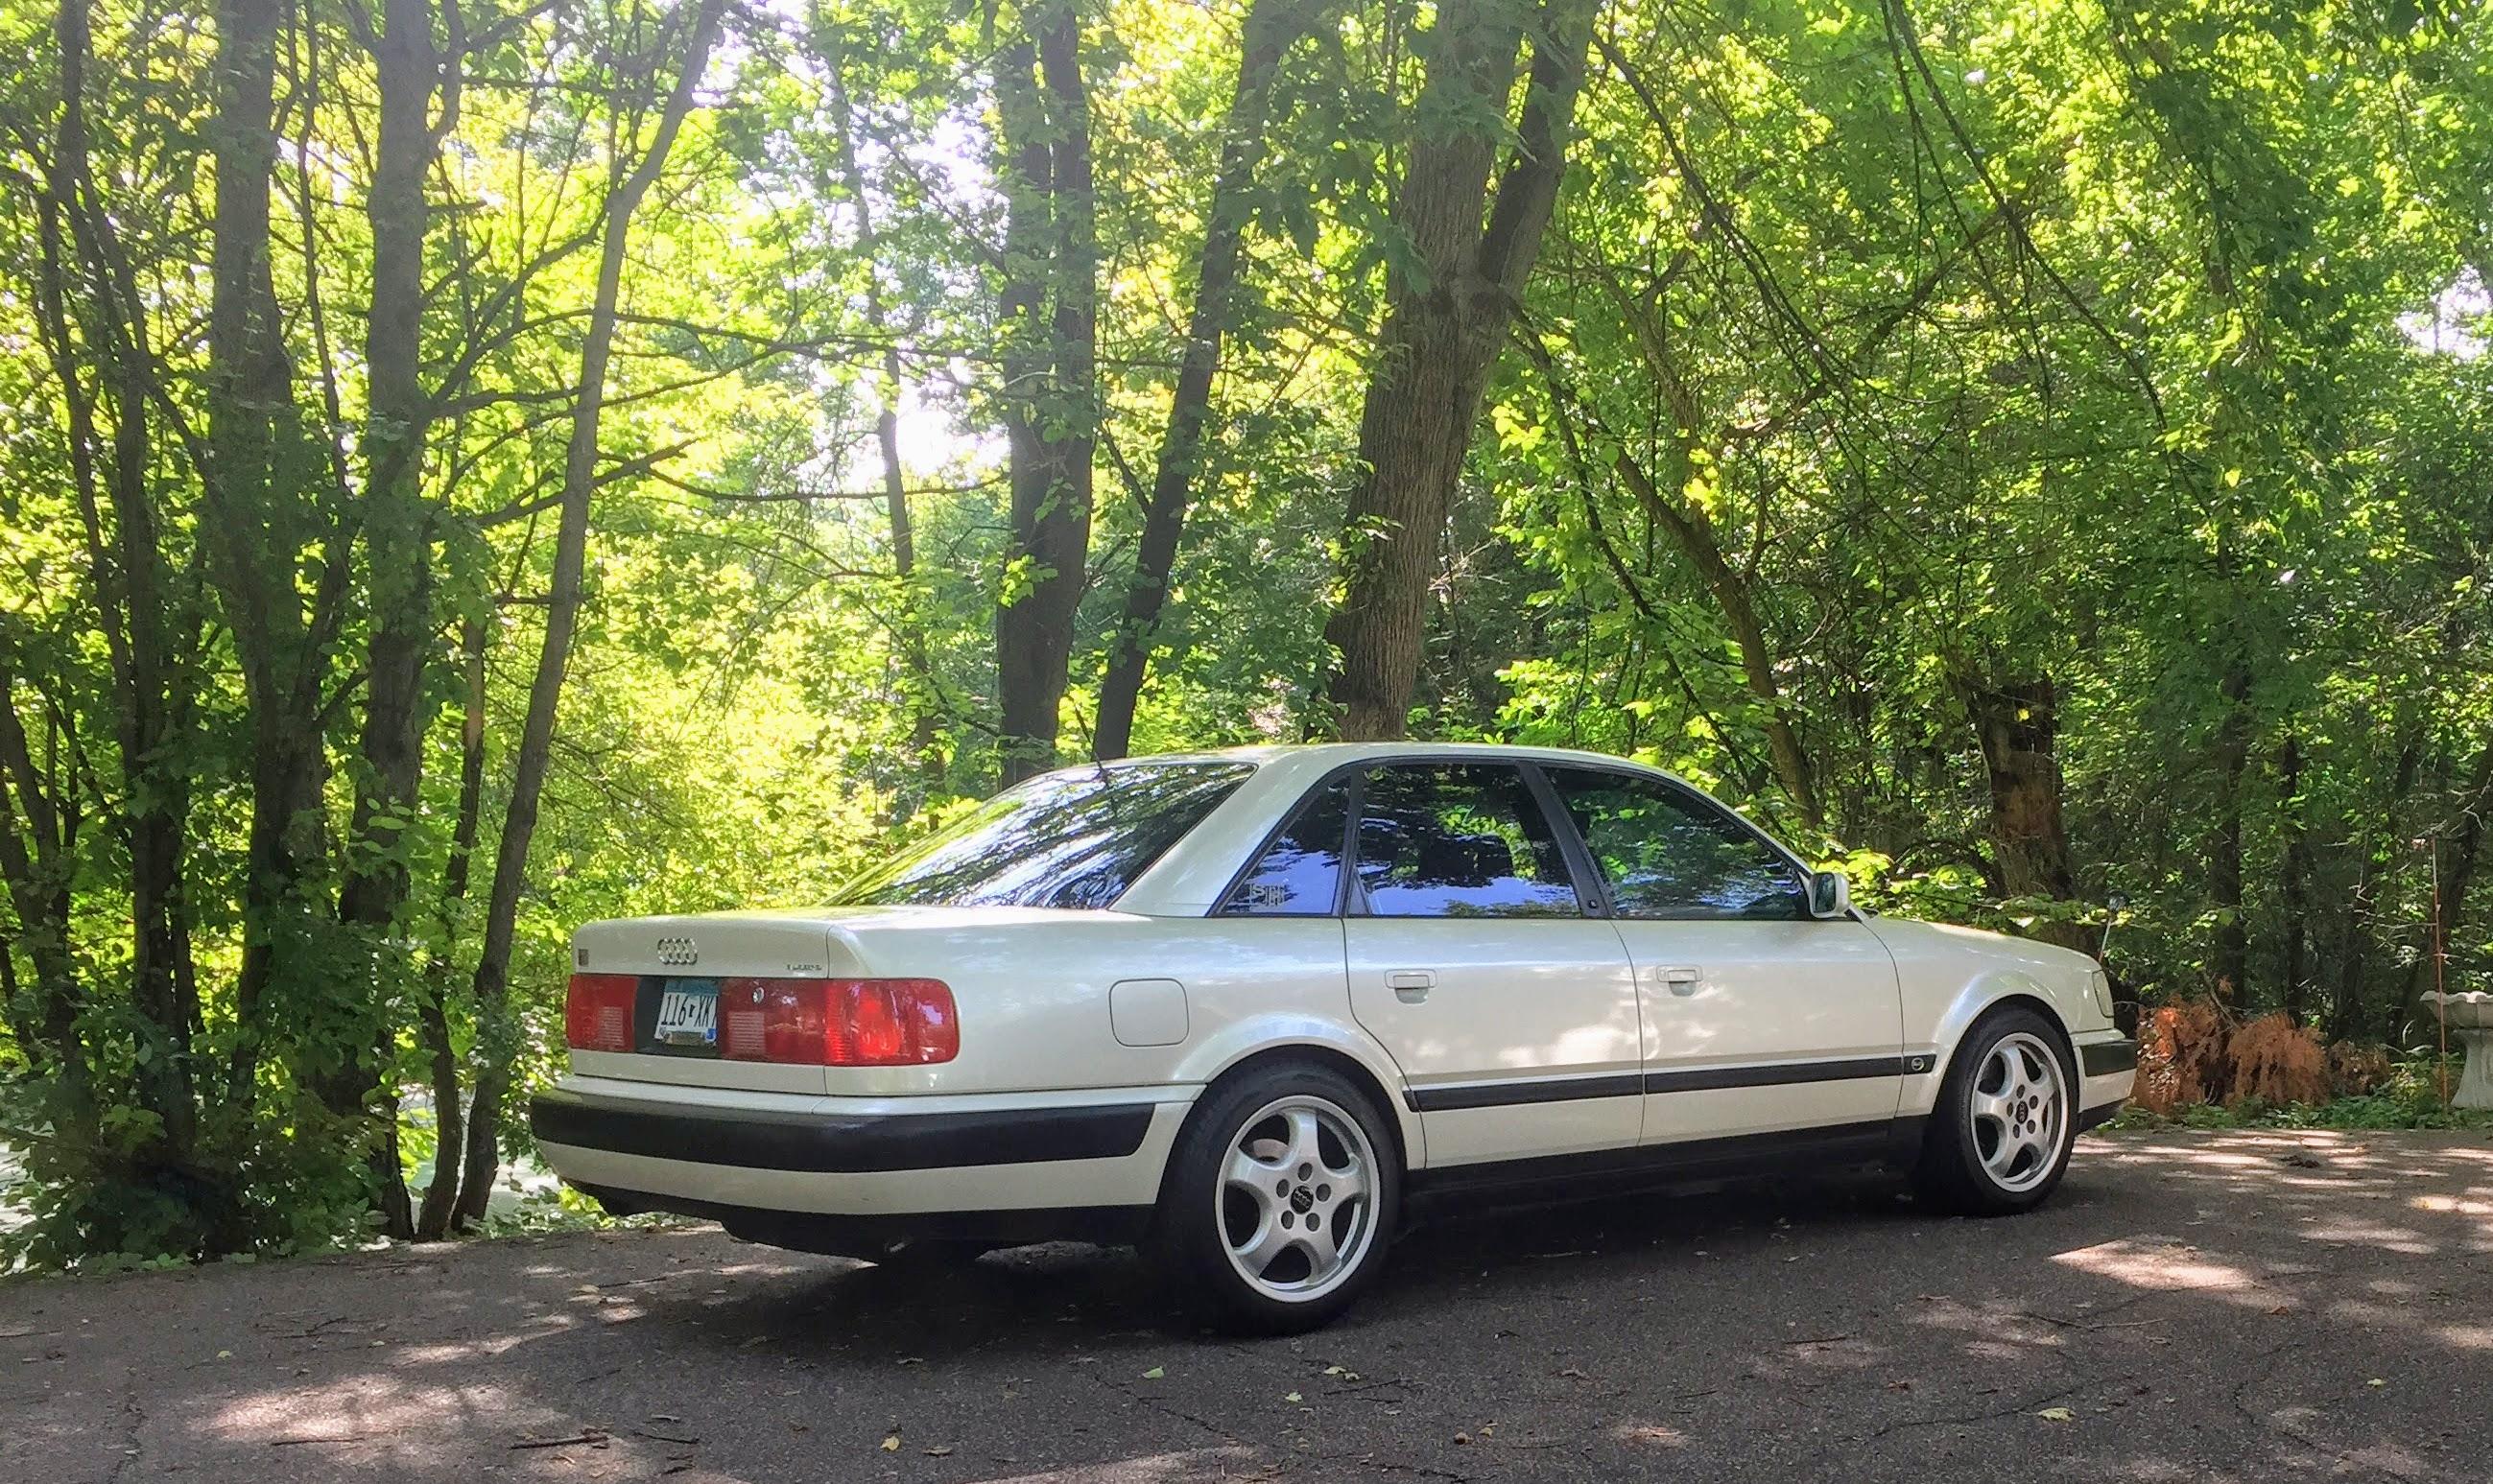 coal 1993 audi s4 my 19th vehicle so far in this series but the rh curbsideclassic com Audi 100 Wagon Audi 100 CS Quattro